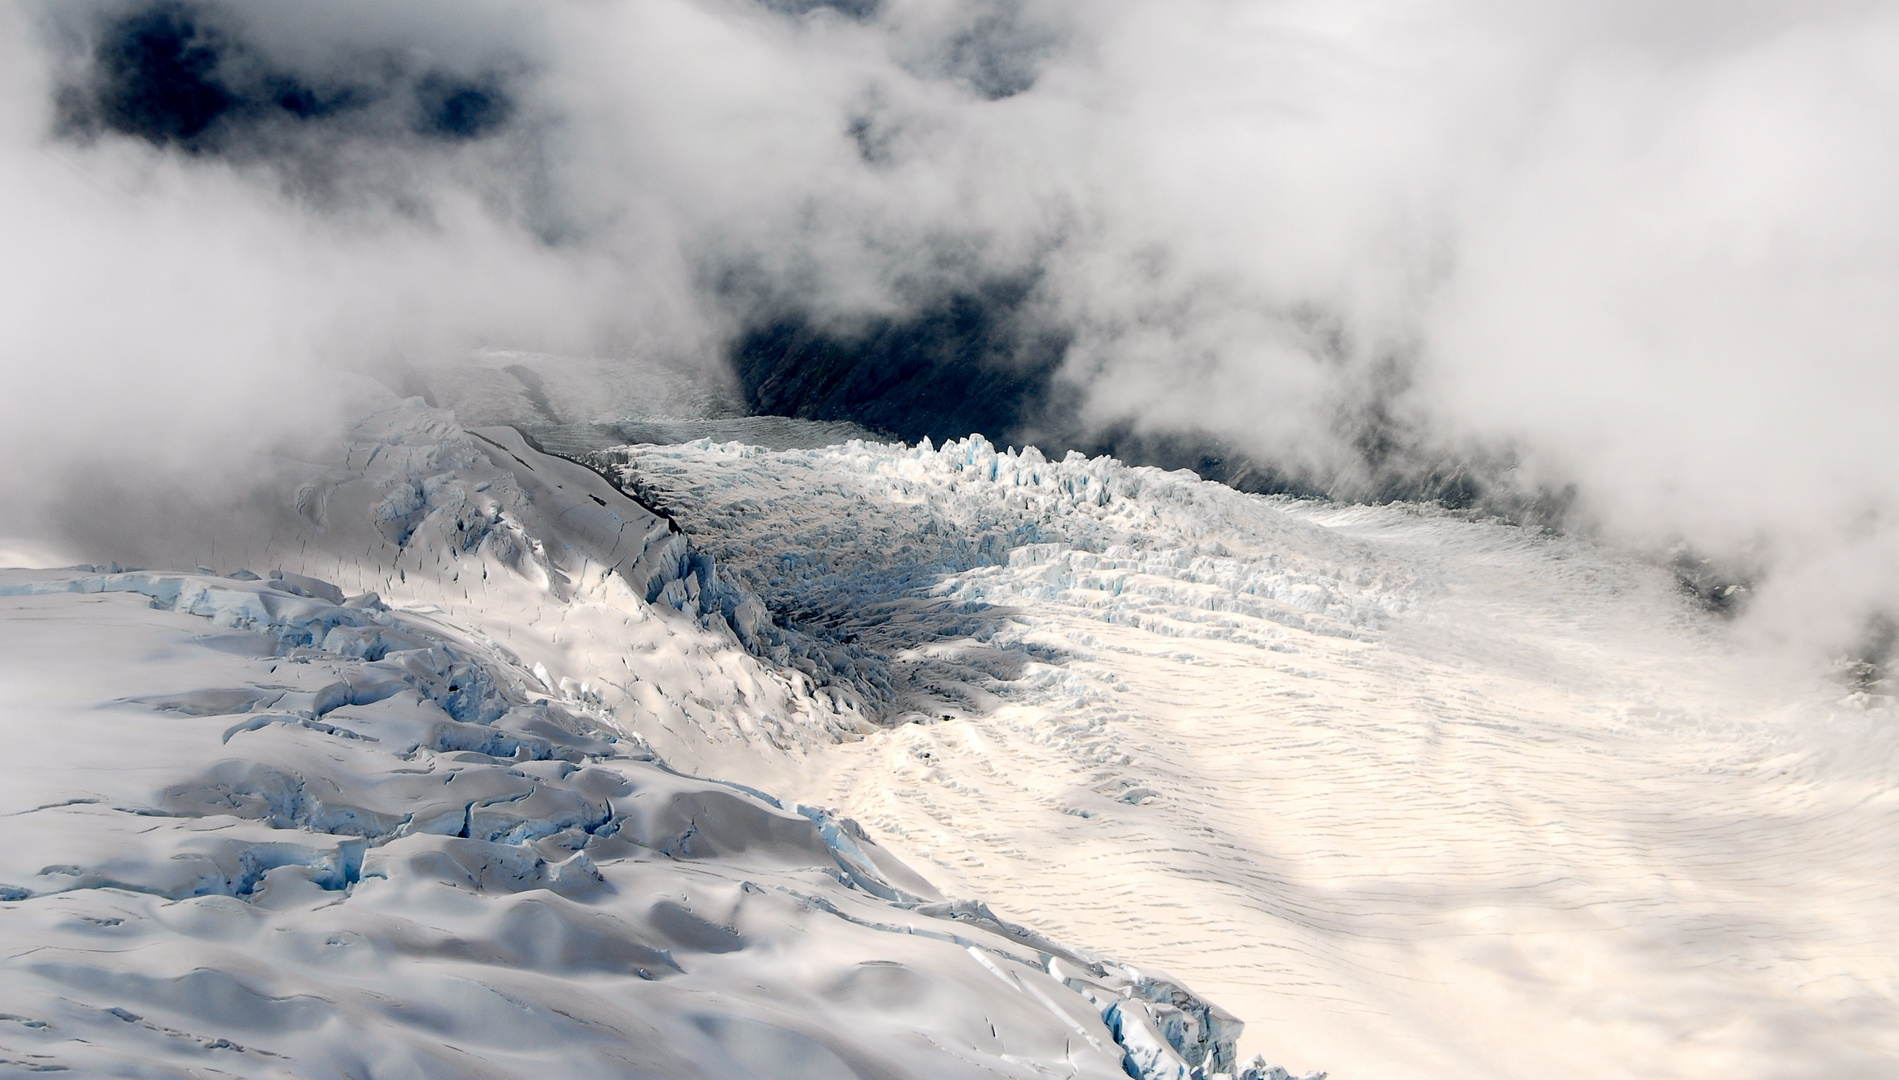 Fox Glacier from above